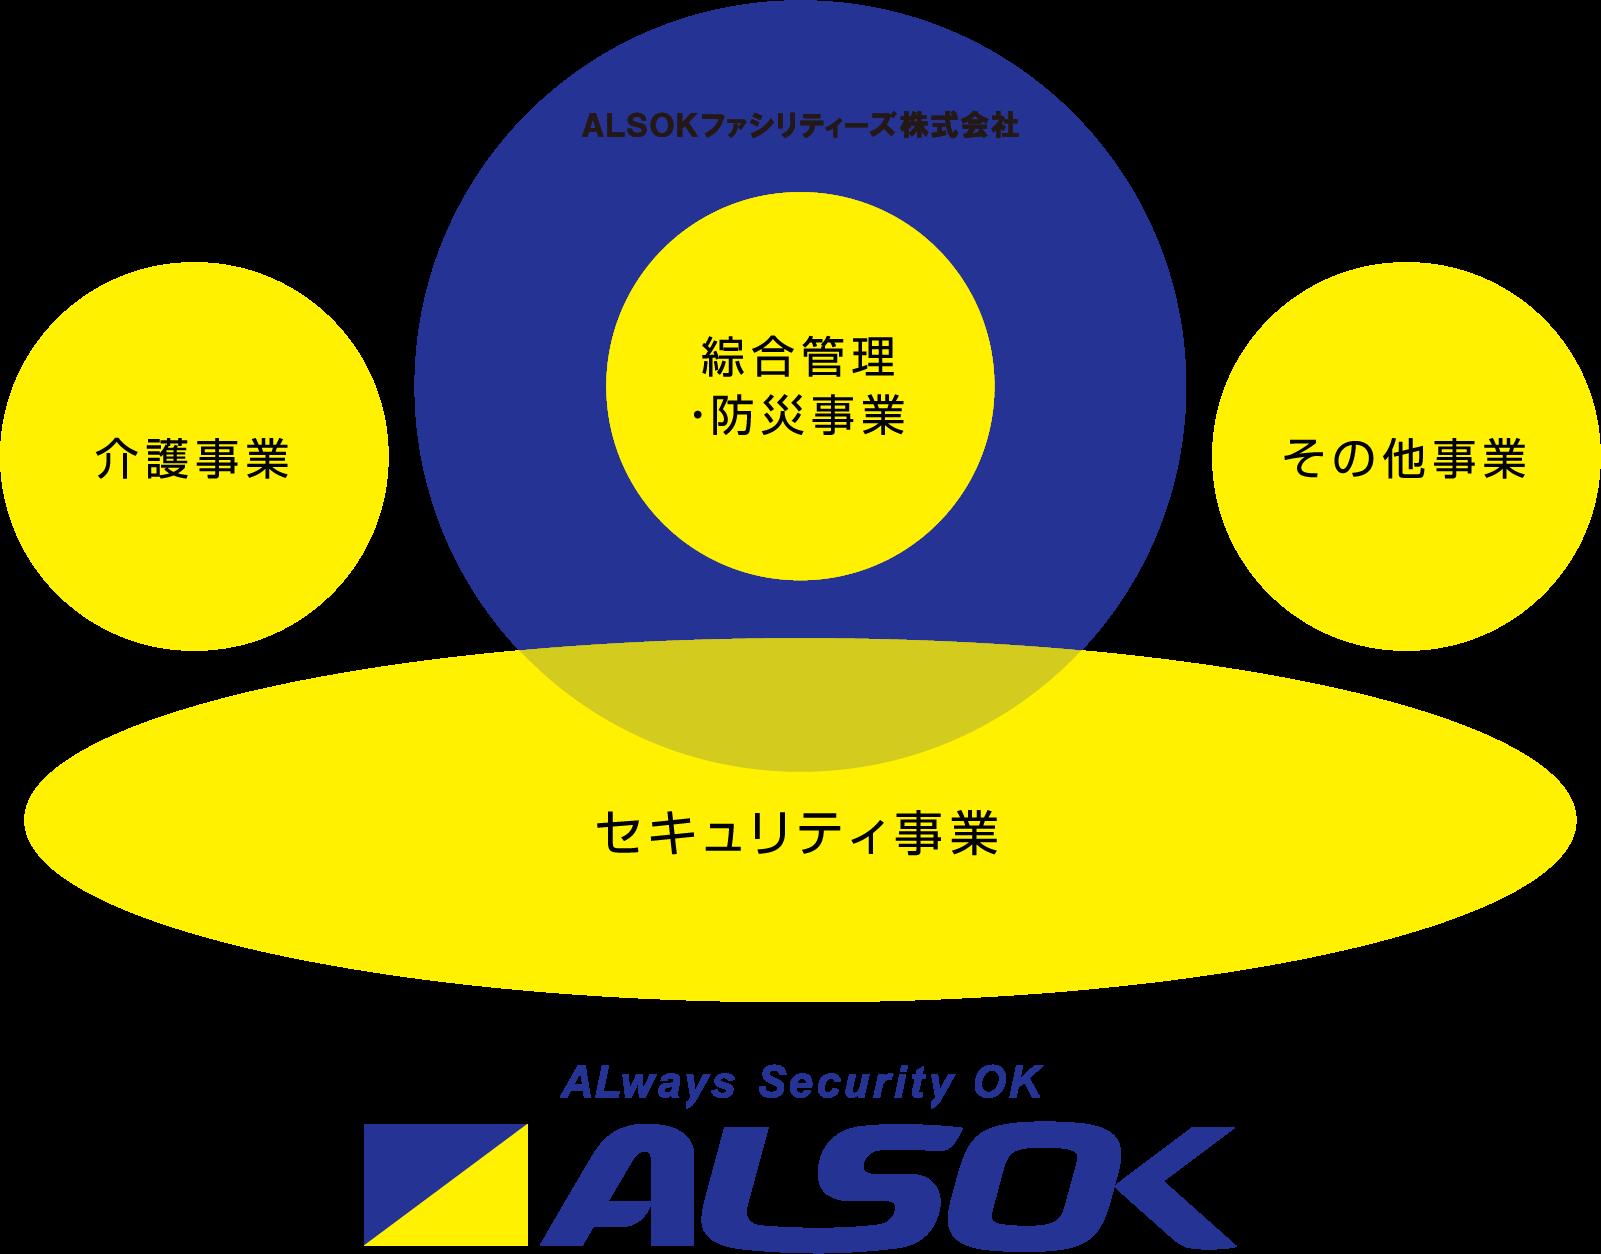 ALSOKグループの事業領域とALSOKファシリティーズ